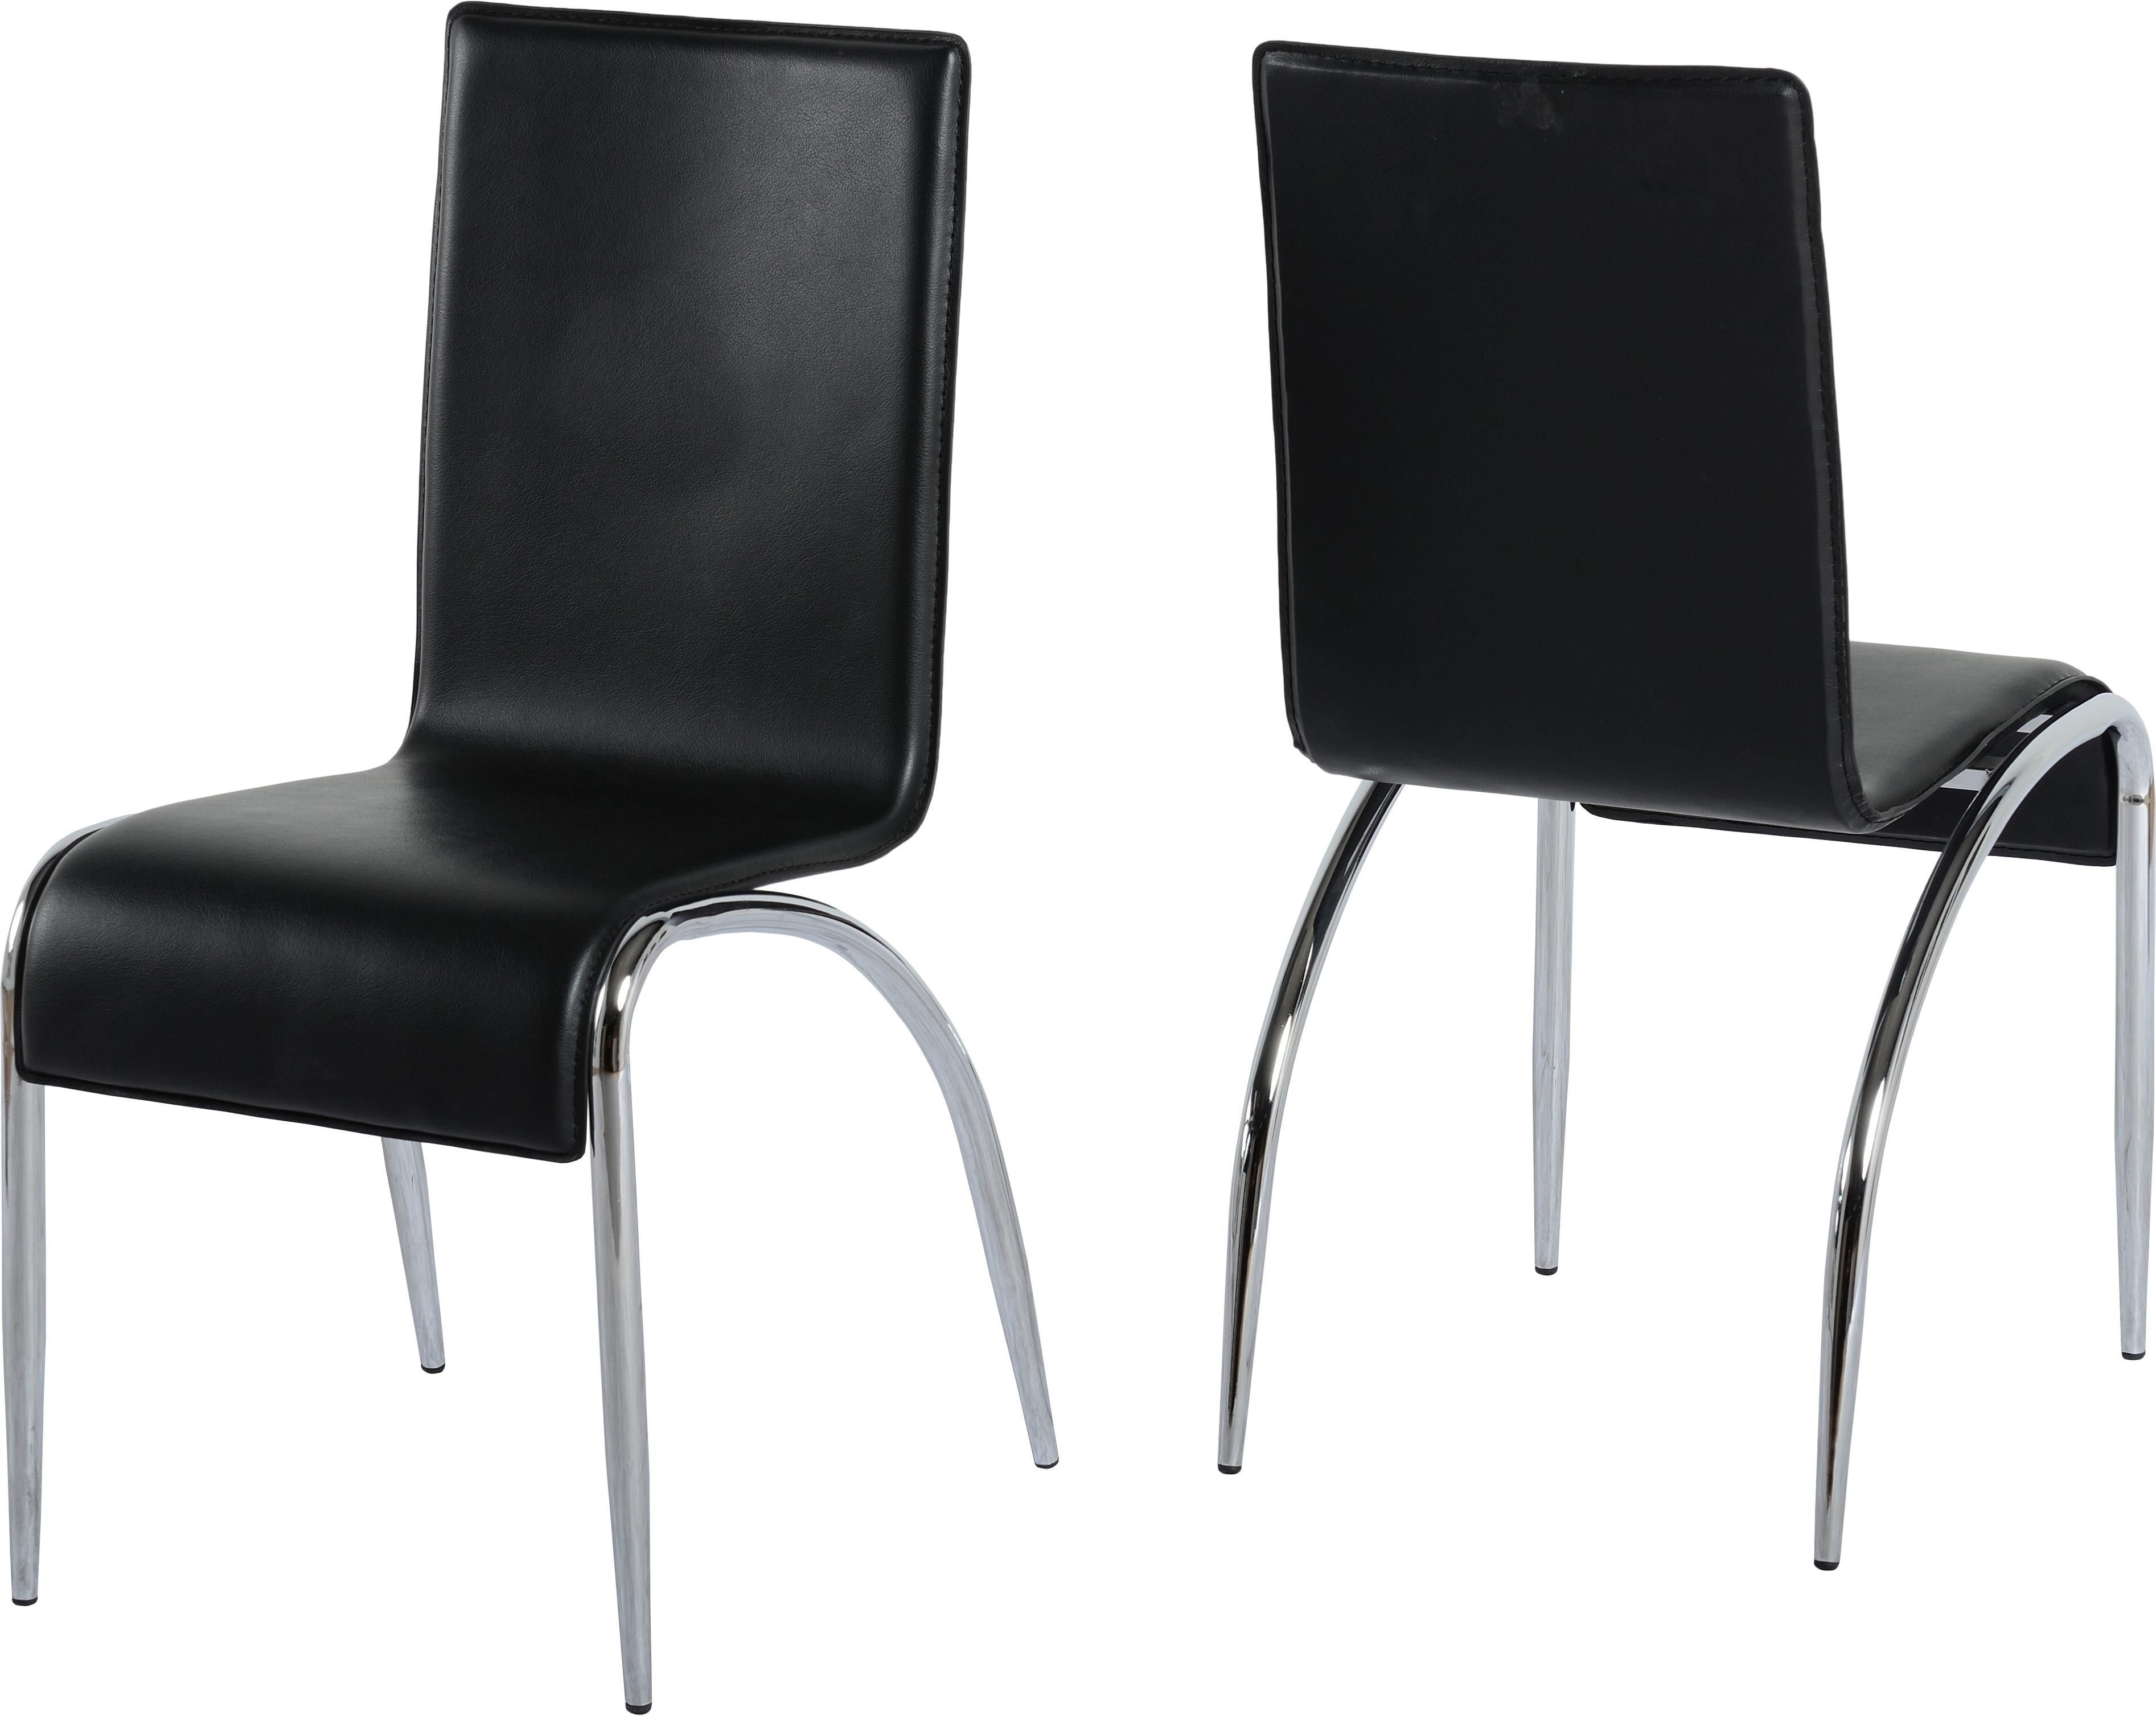 Chloe Chair Black